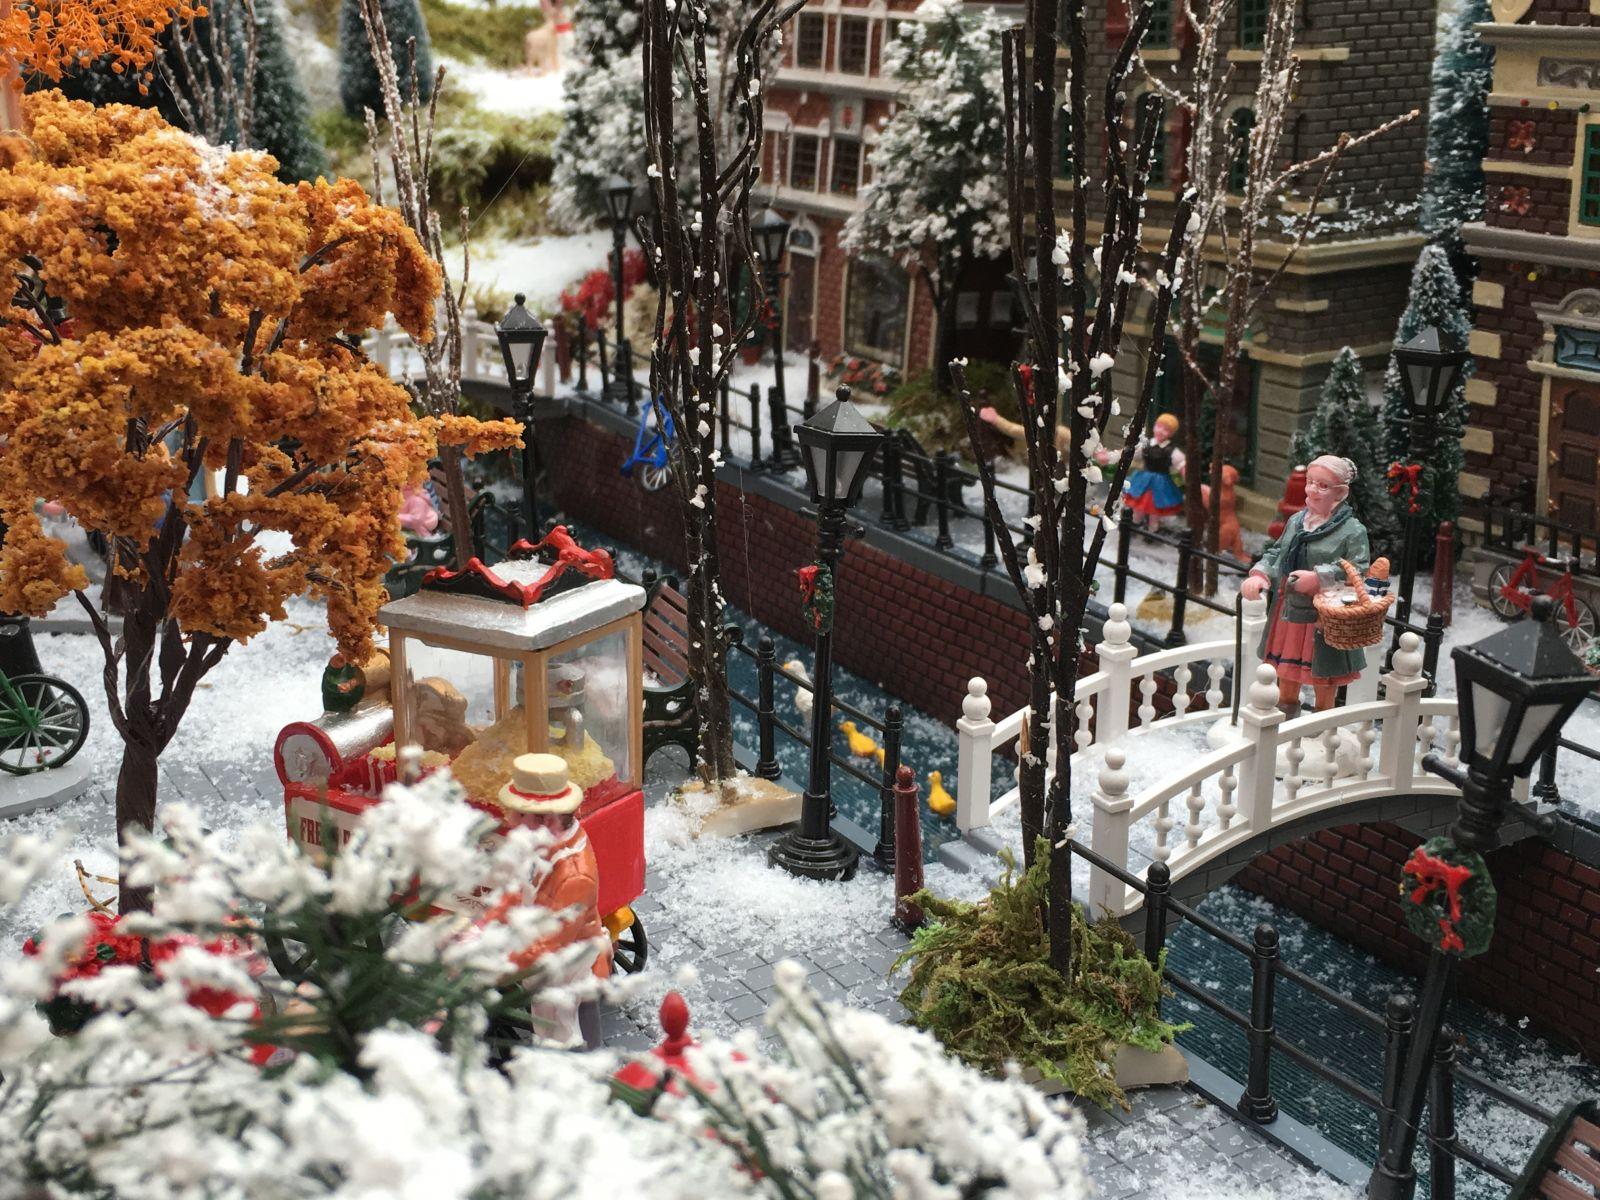 Lemax gracht in mini-kerstdorp bij tuincentrum Osdorp 2016